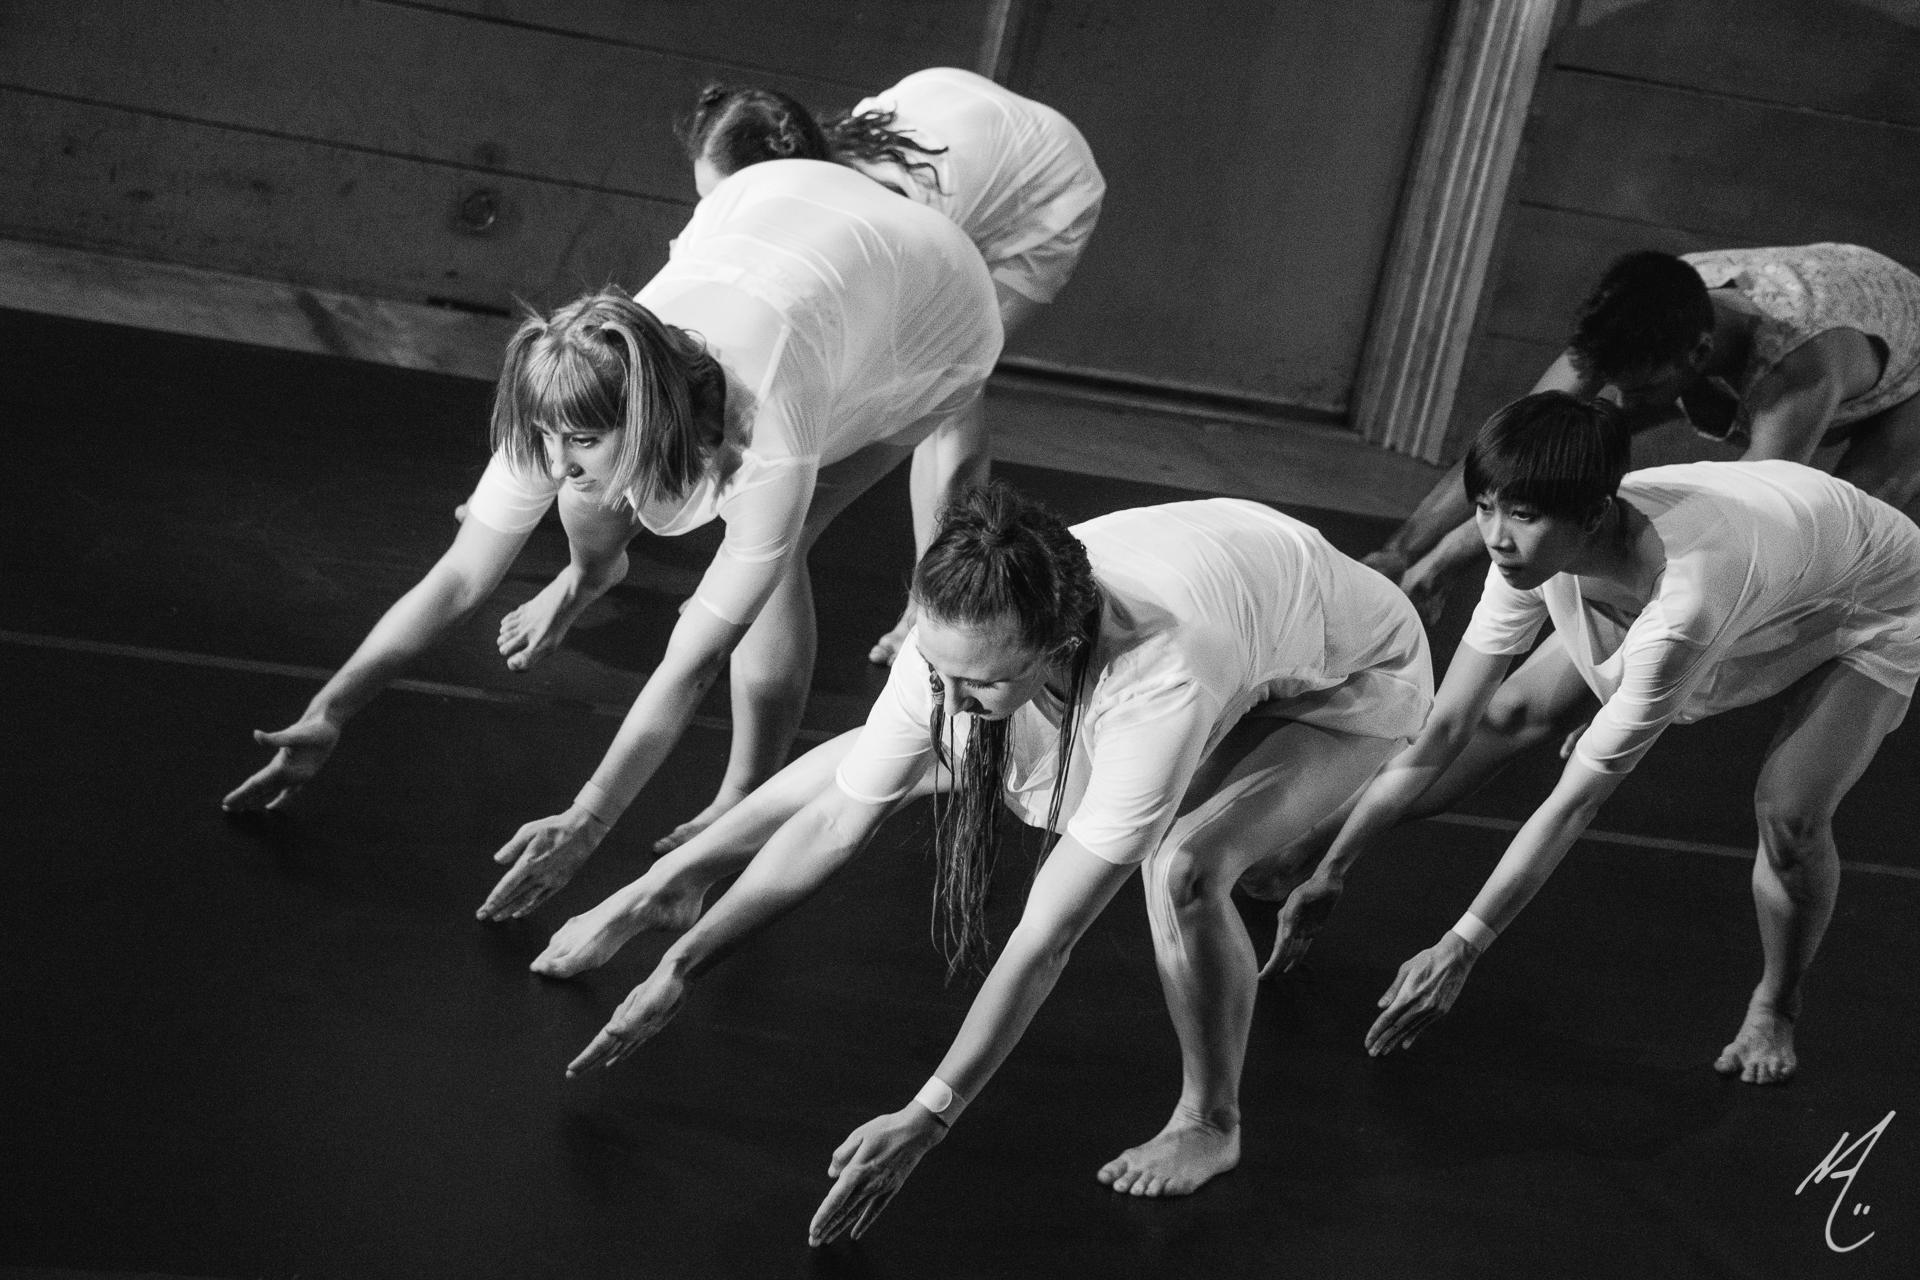 Dancers: Emily Rushing, Katie Hopkins, Alexa Capareda, Clay Moore, Peyton Cunningham